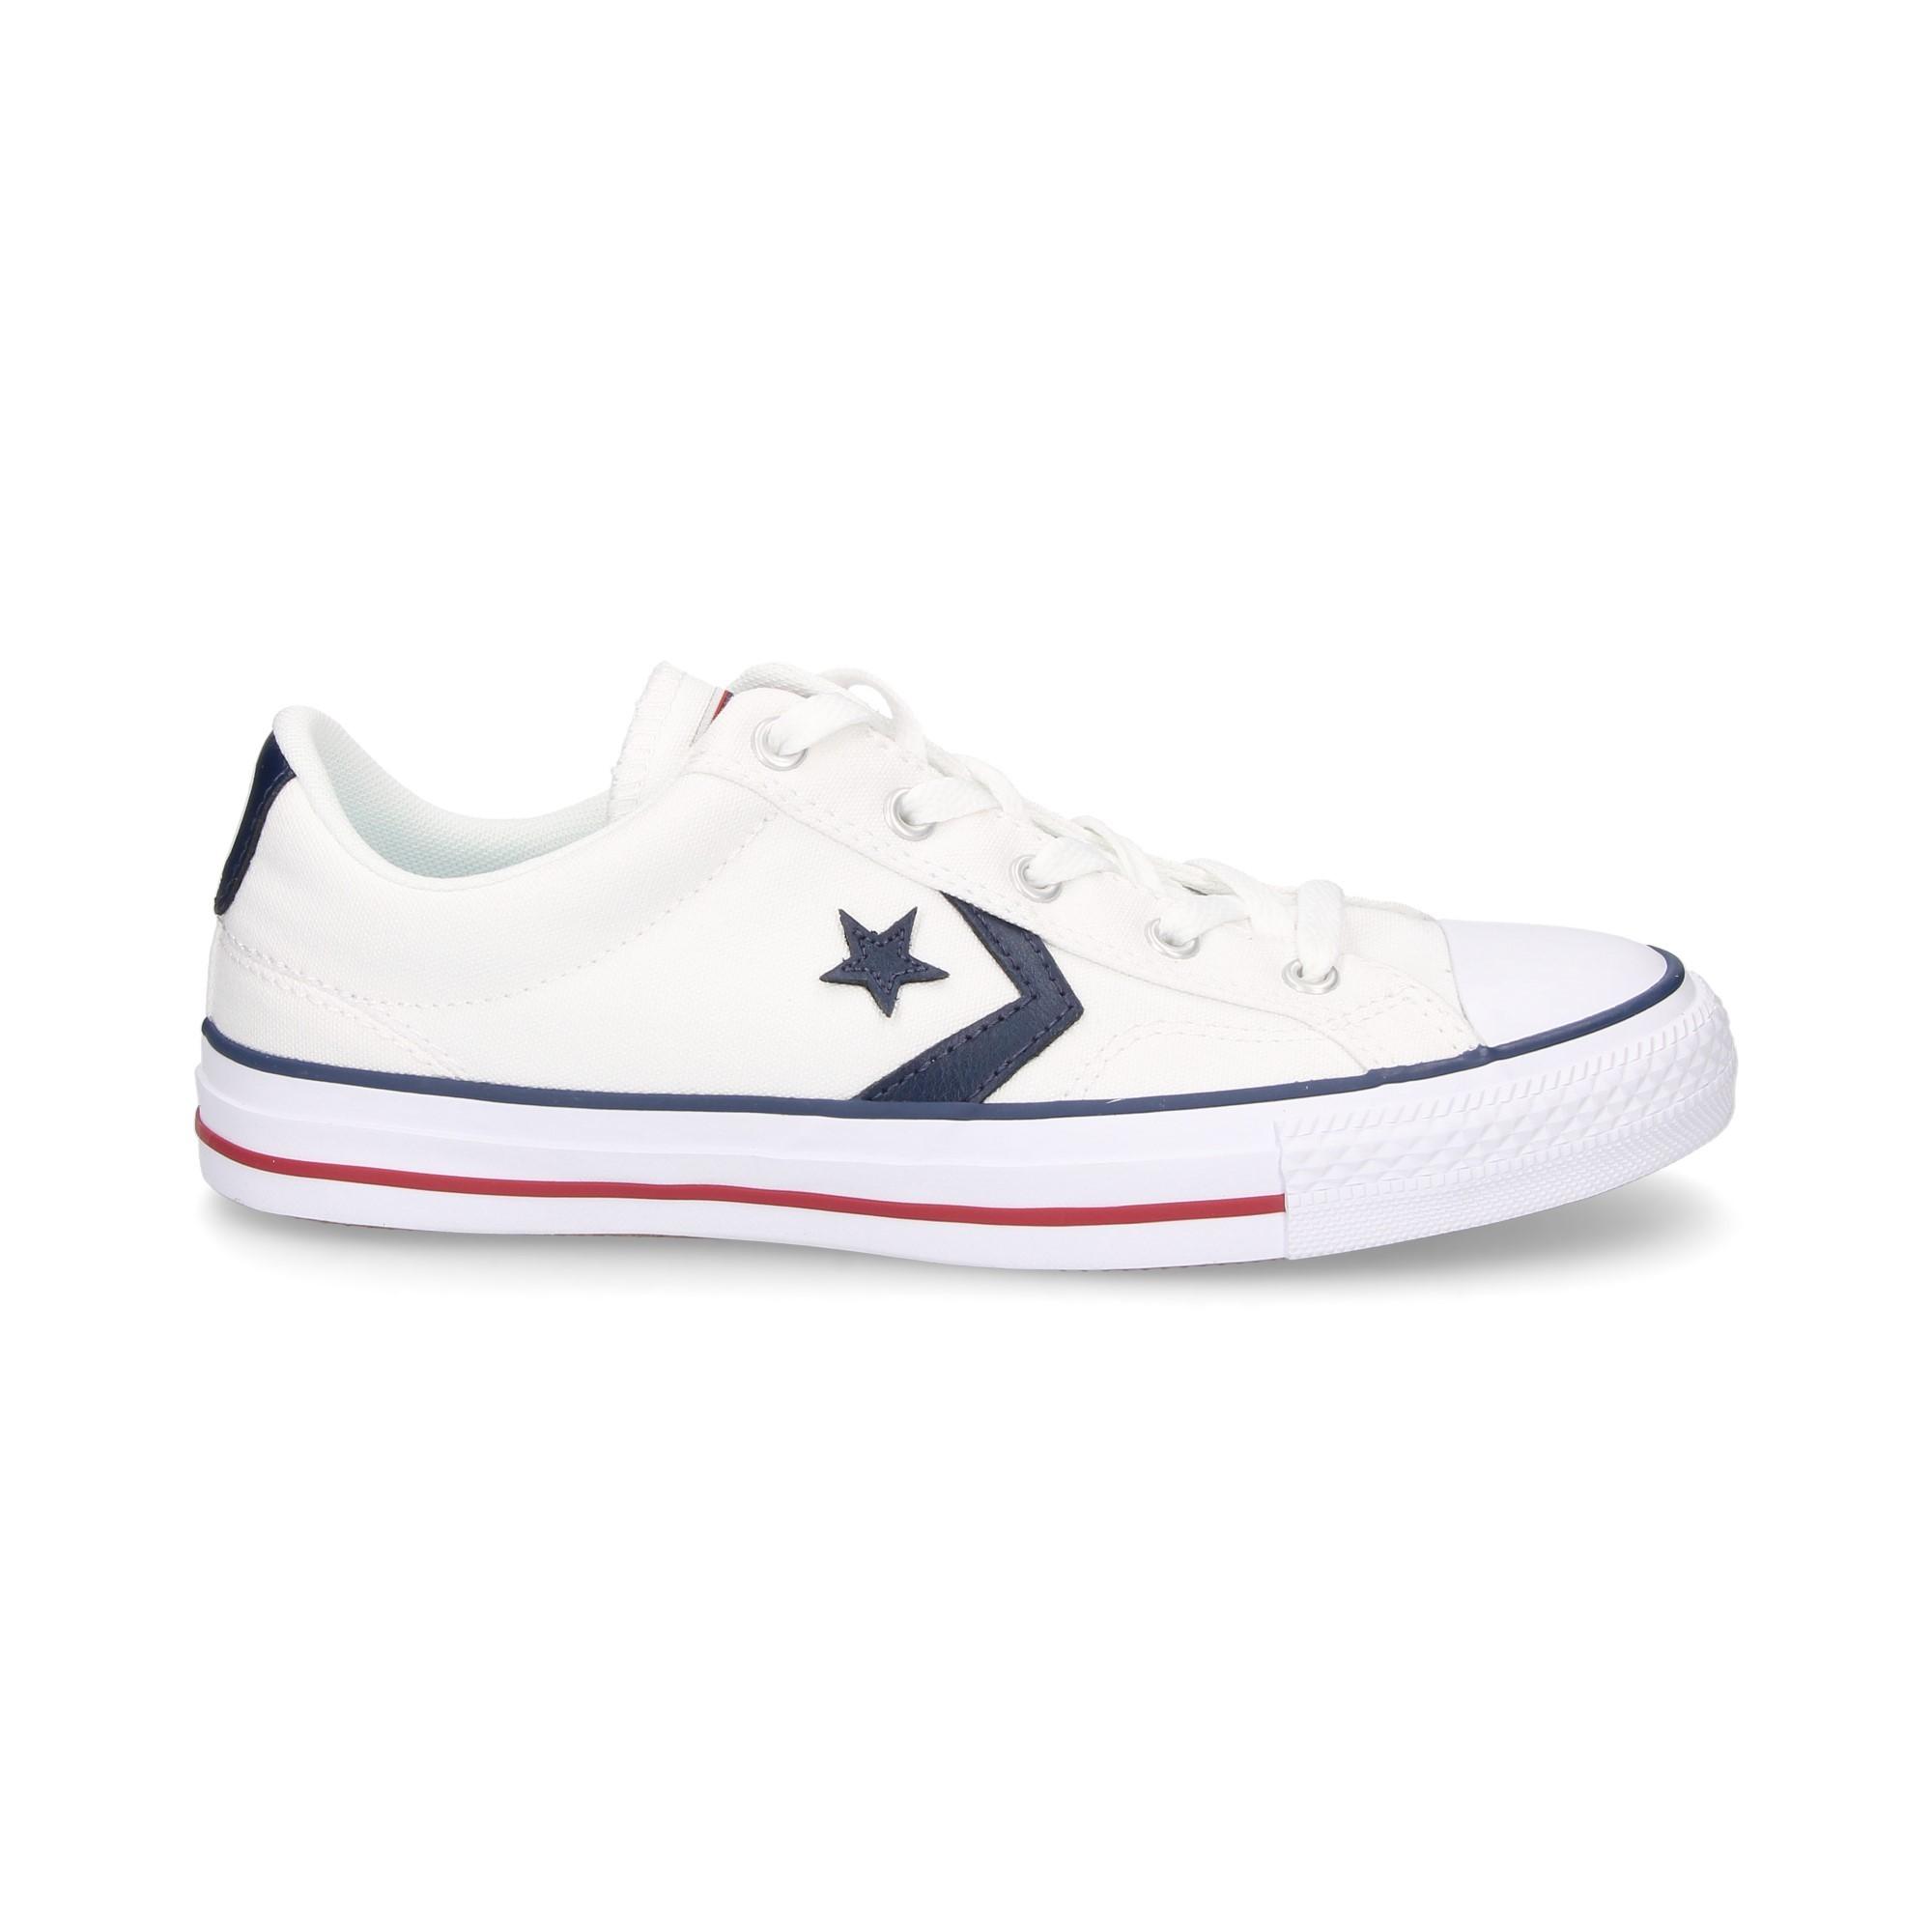 CONVERSE Men's sneakers 144151C BLANCO